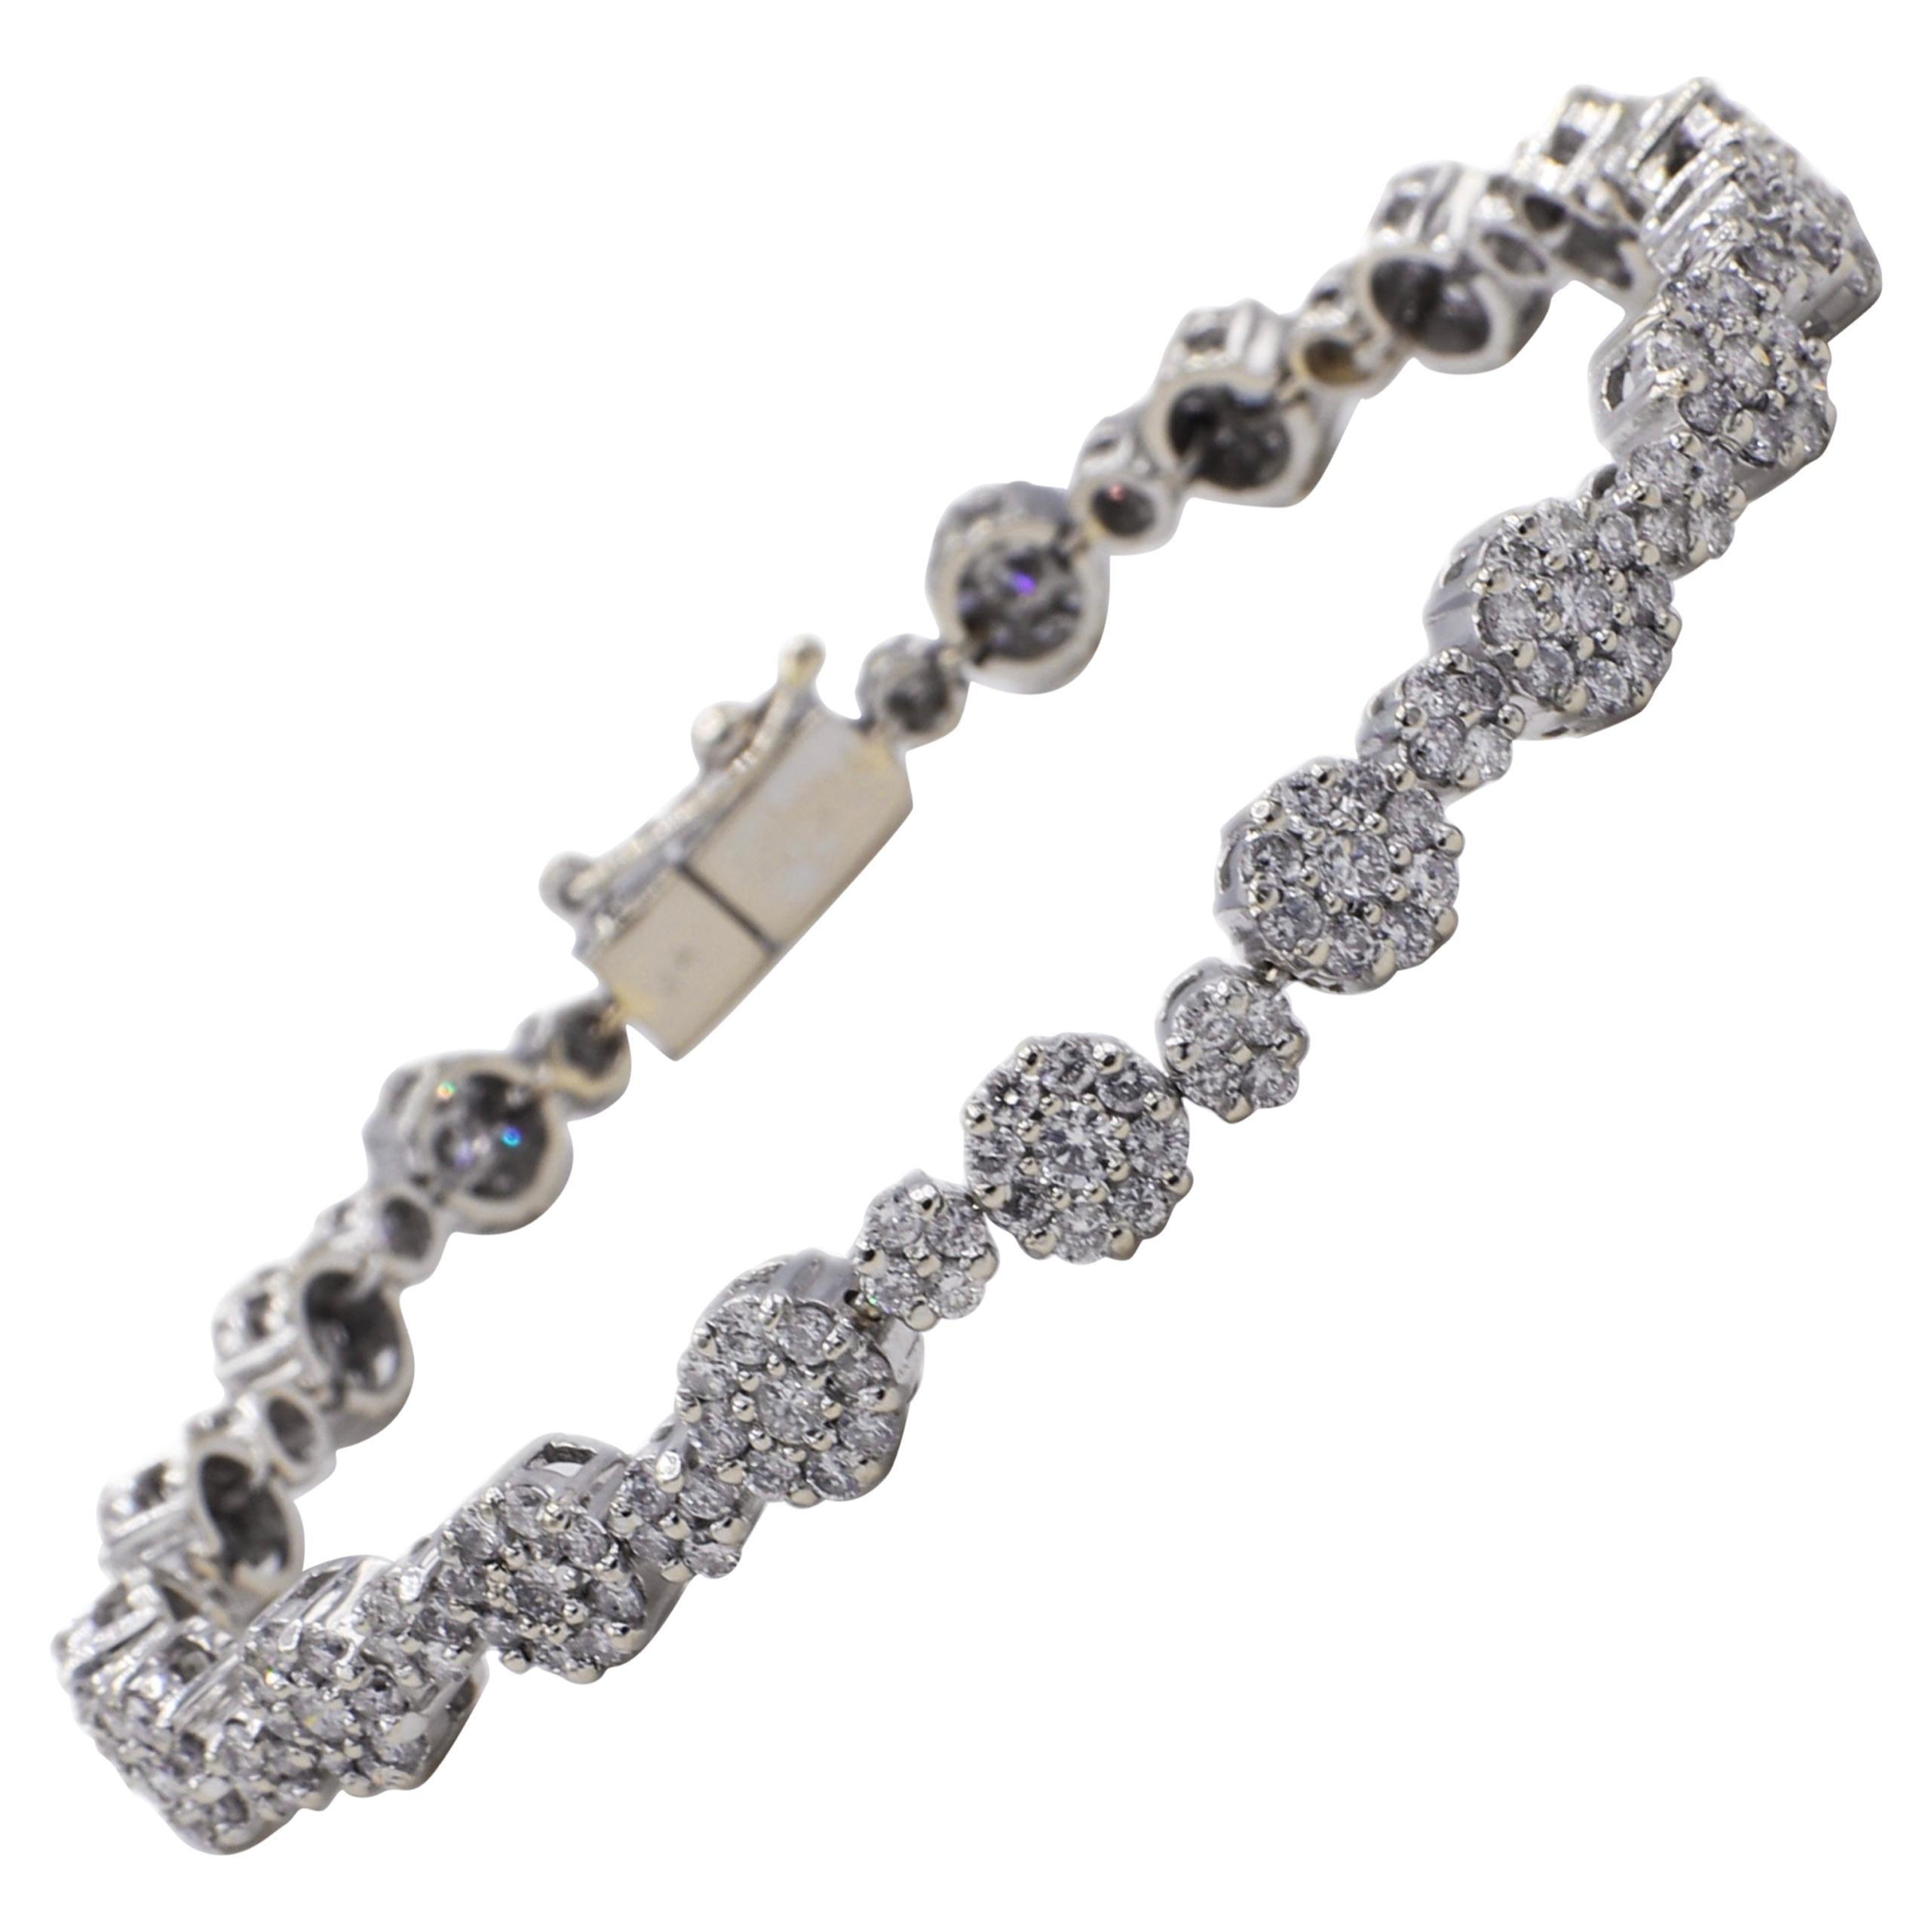 14 Karat White Gold 3.00 Carat Diamond Cluster Tennis Bracelet